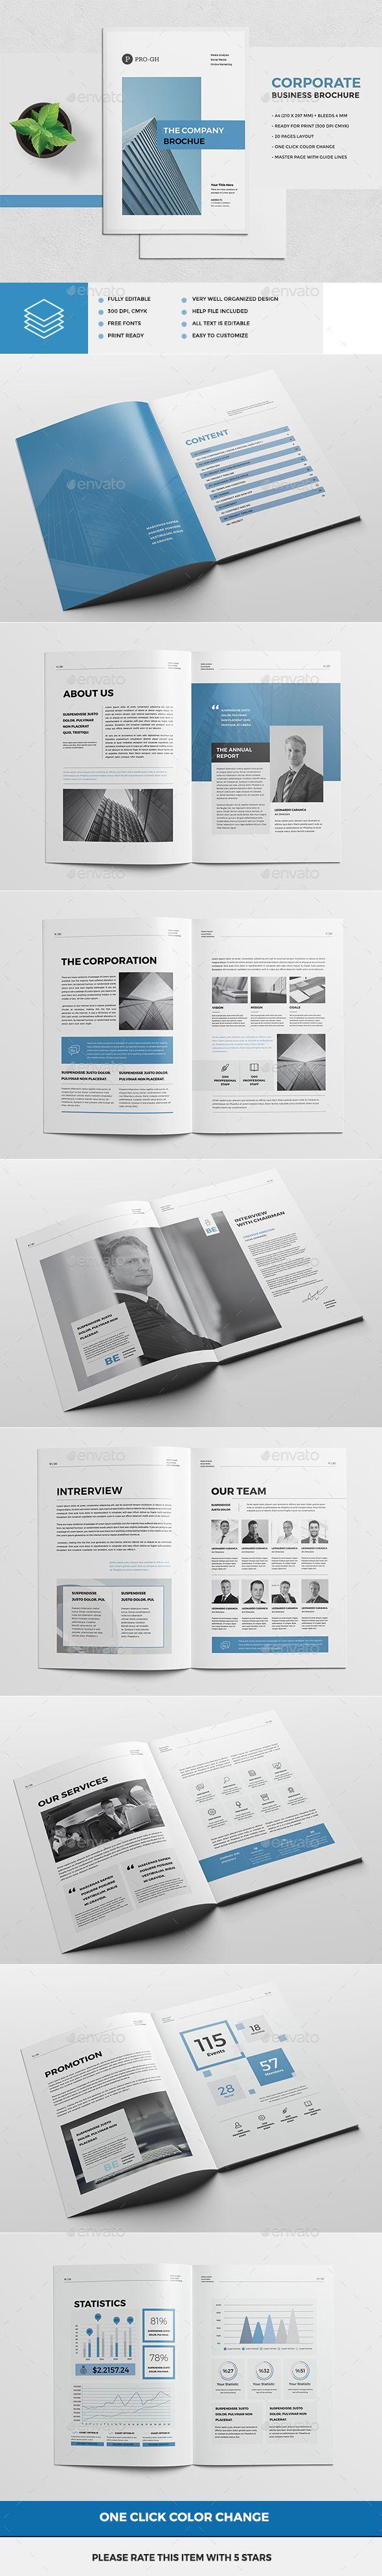 Company Profile Brochure Template InDesign INDD | design | Pinterest